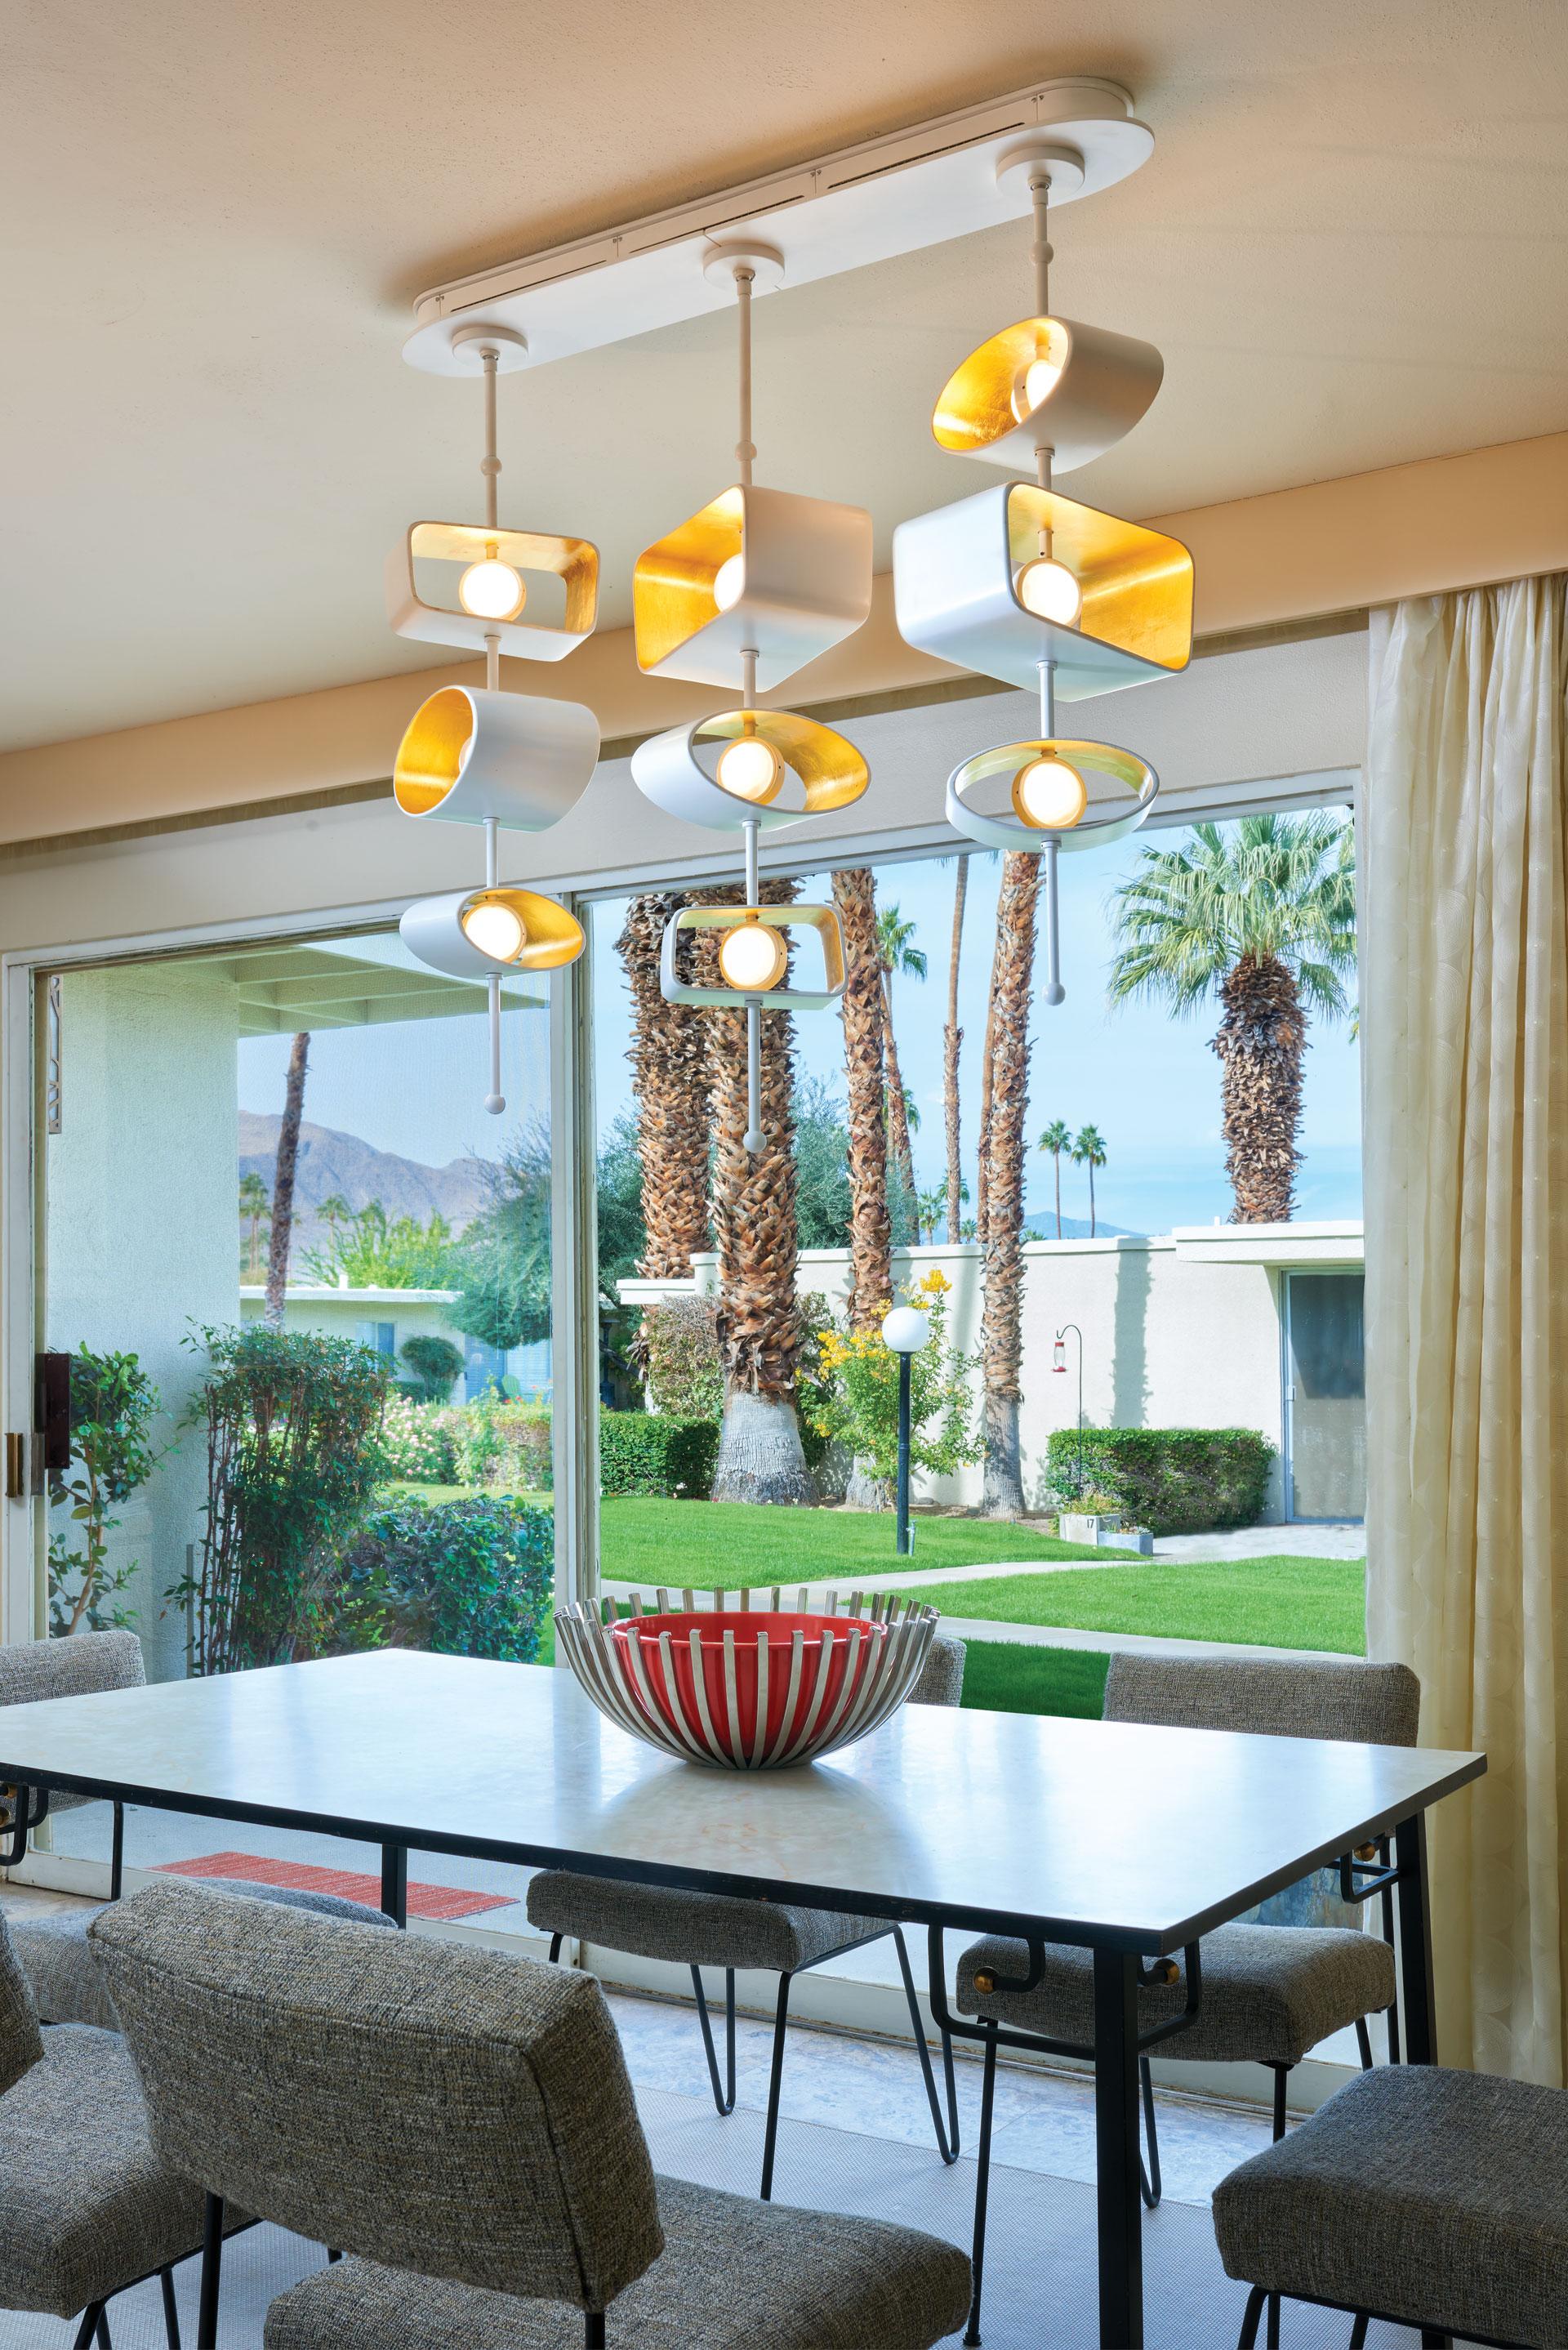 Totem Linear Pendant_Boyd Lighting_Palm Springs dining room